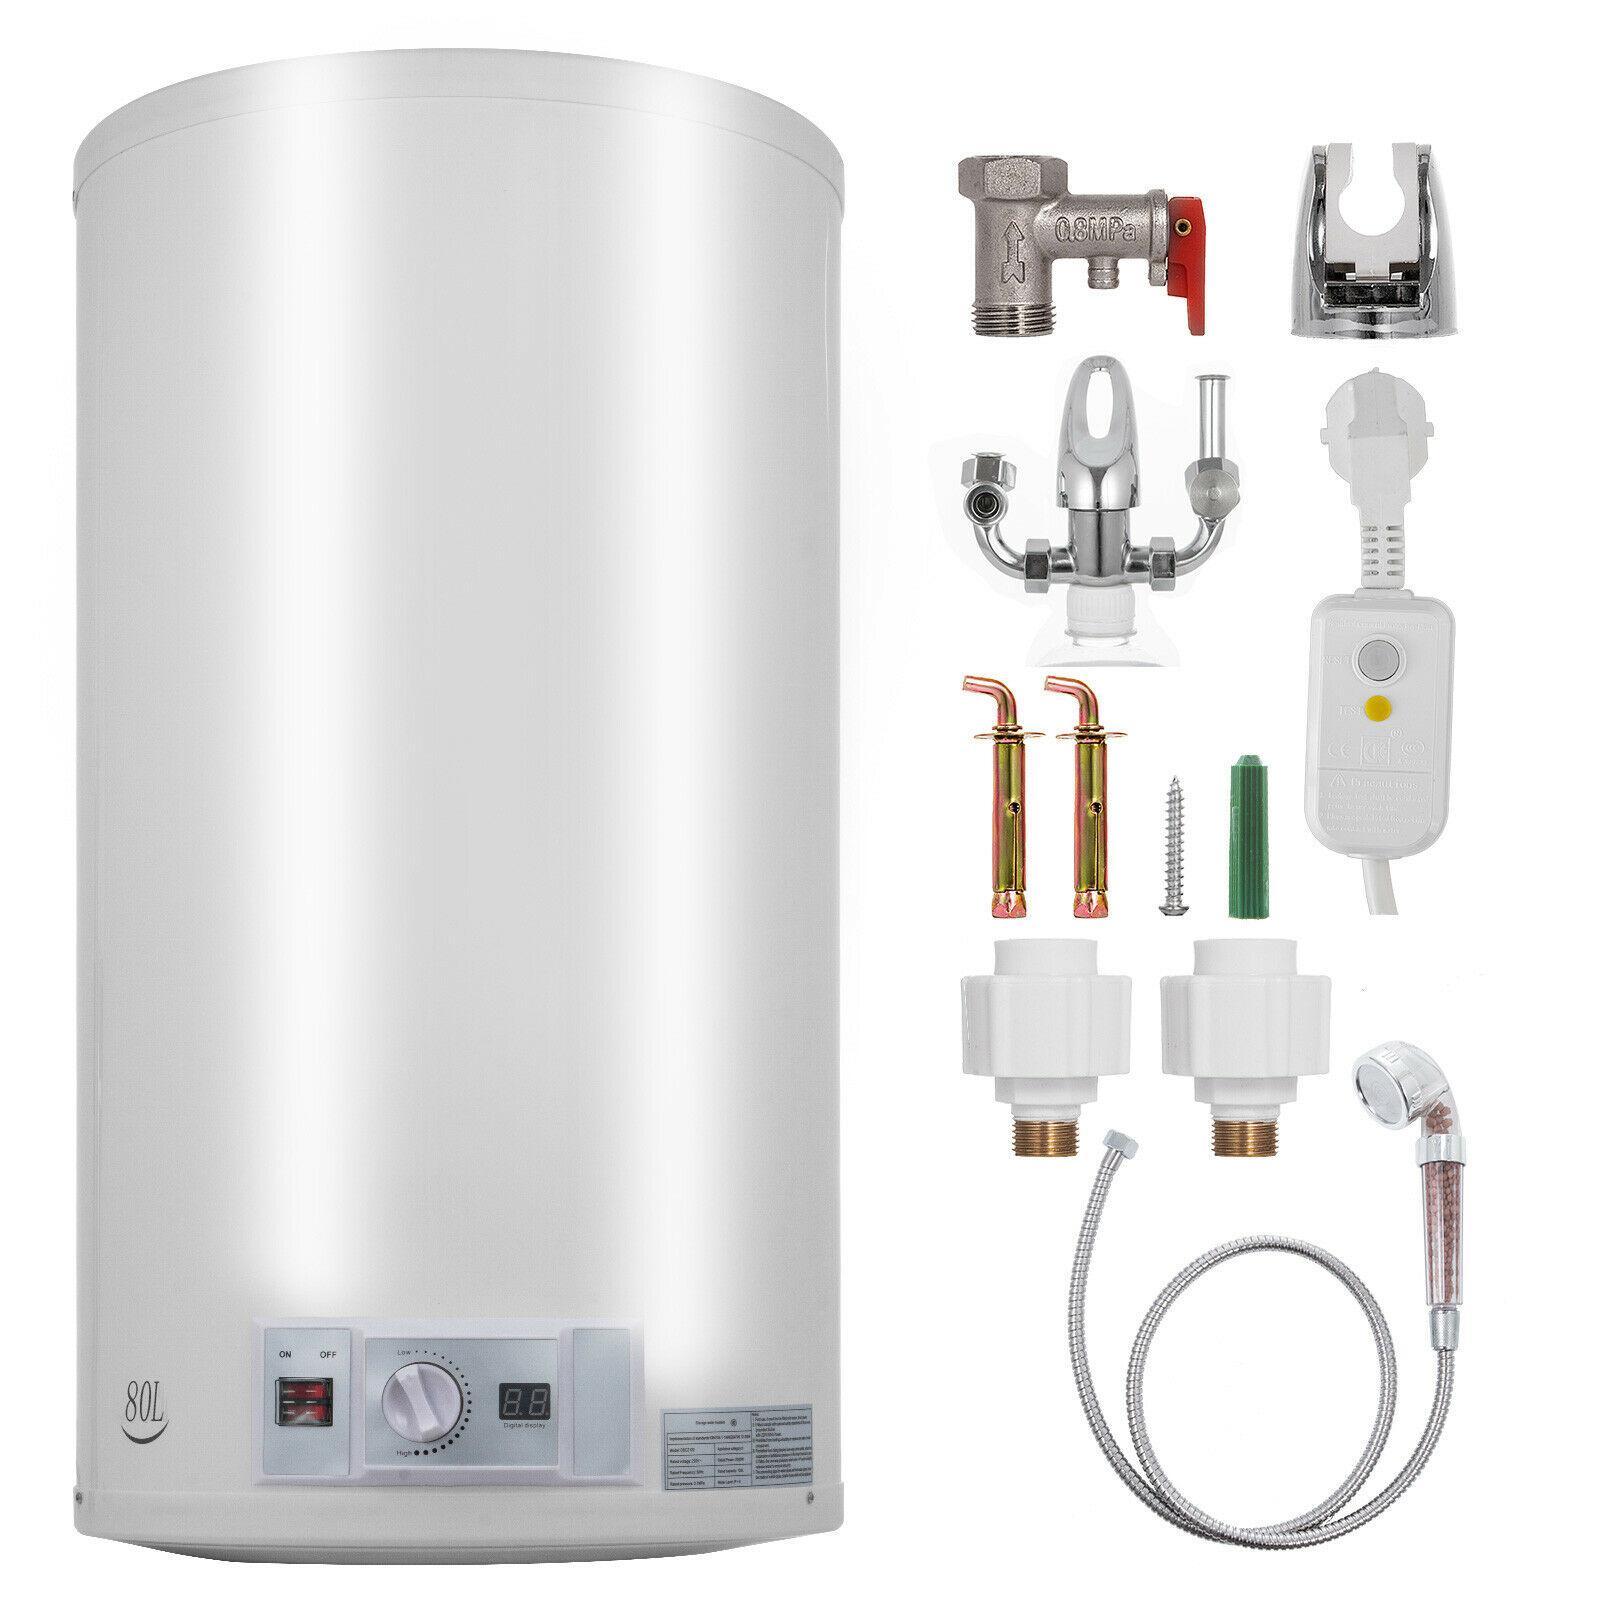 VEVOR-سخان مياه كهربائي 80 لتر ، غلاية ، خزان ، رأس دش عمودي